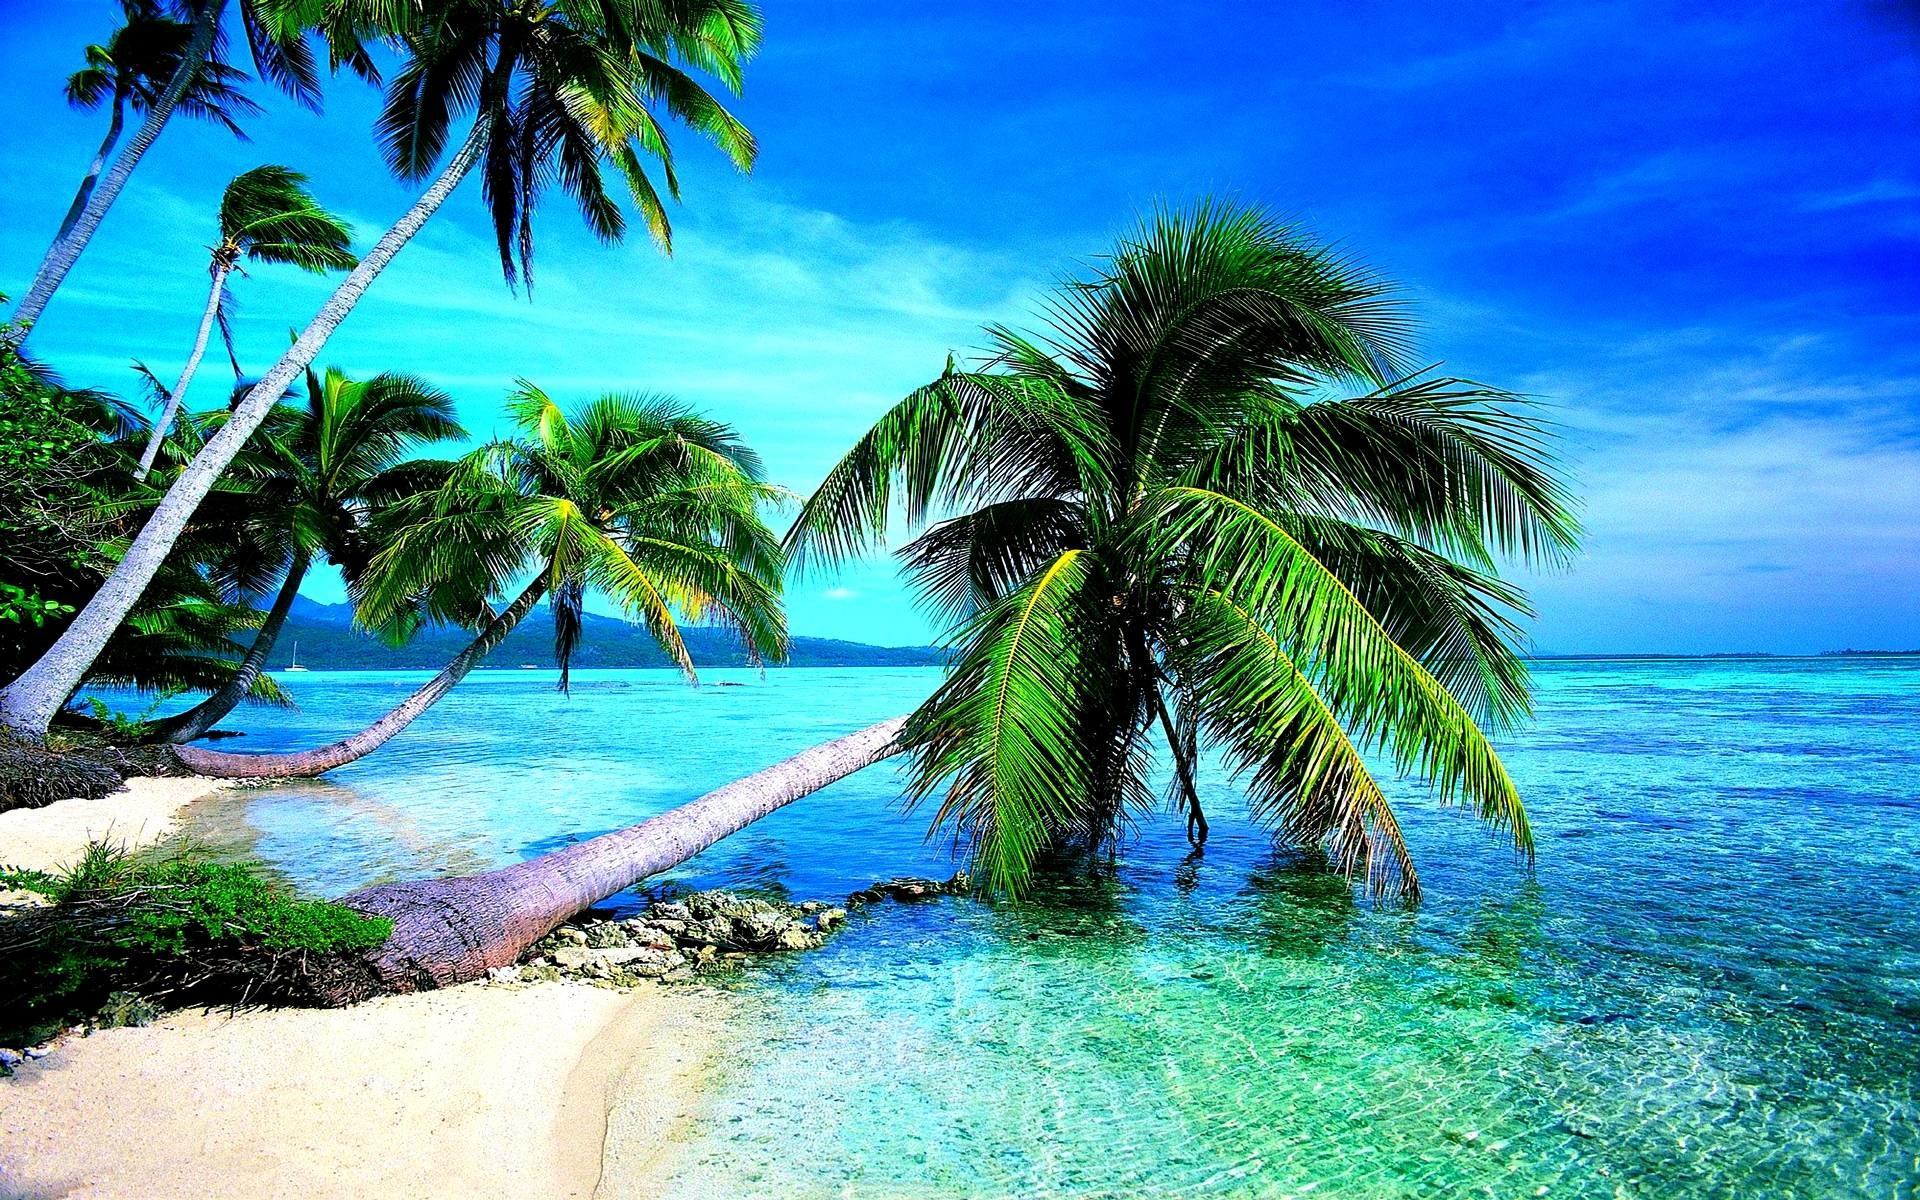 1920x1200 Image - Download-tropical-beach-wallpaper-hd-desktop.jpg .